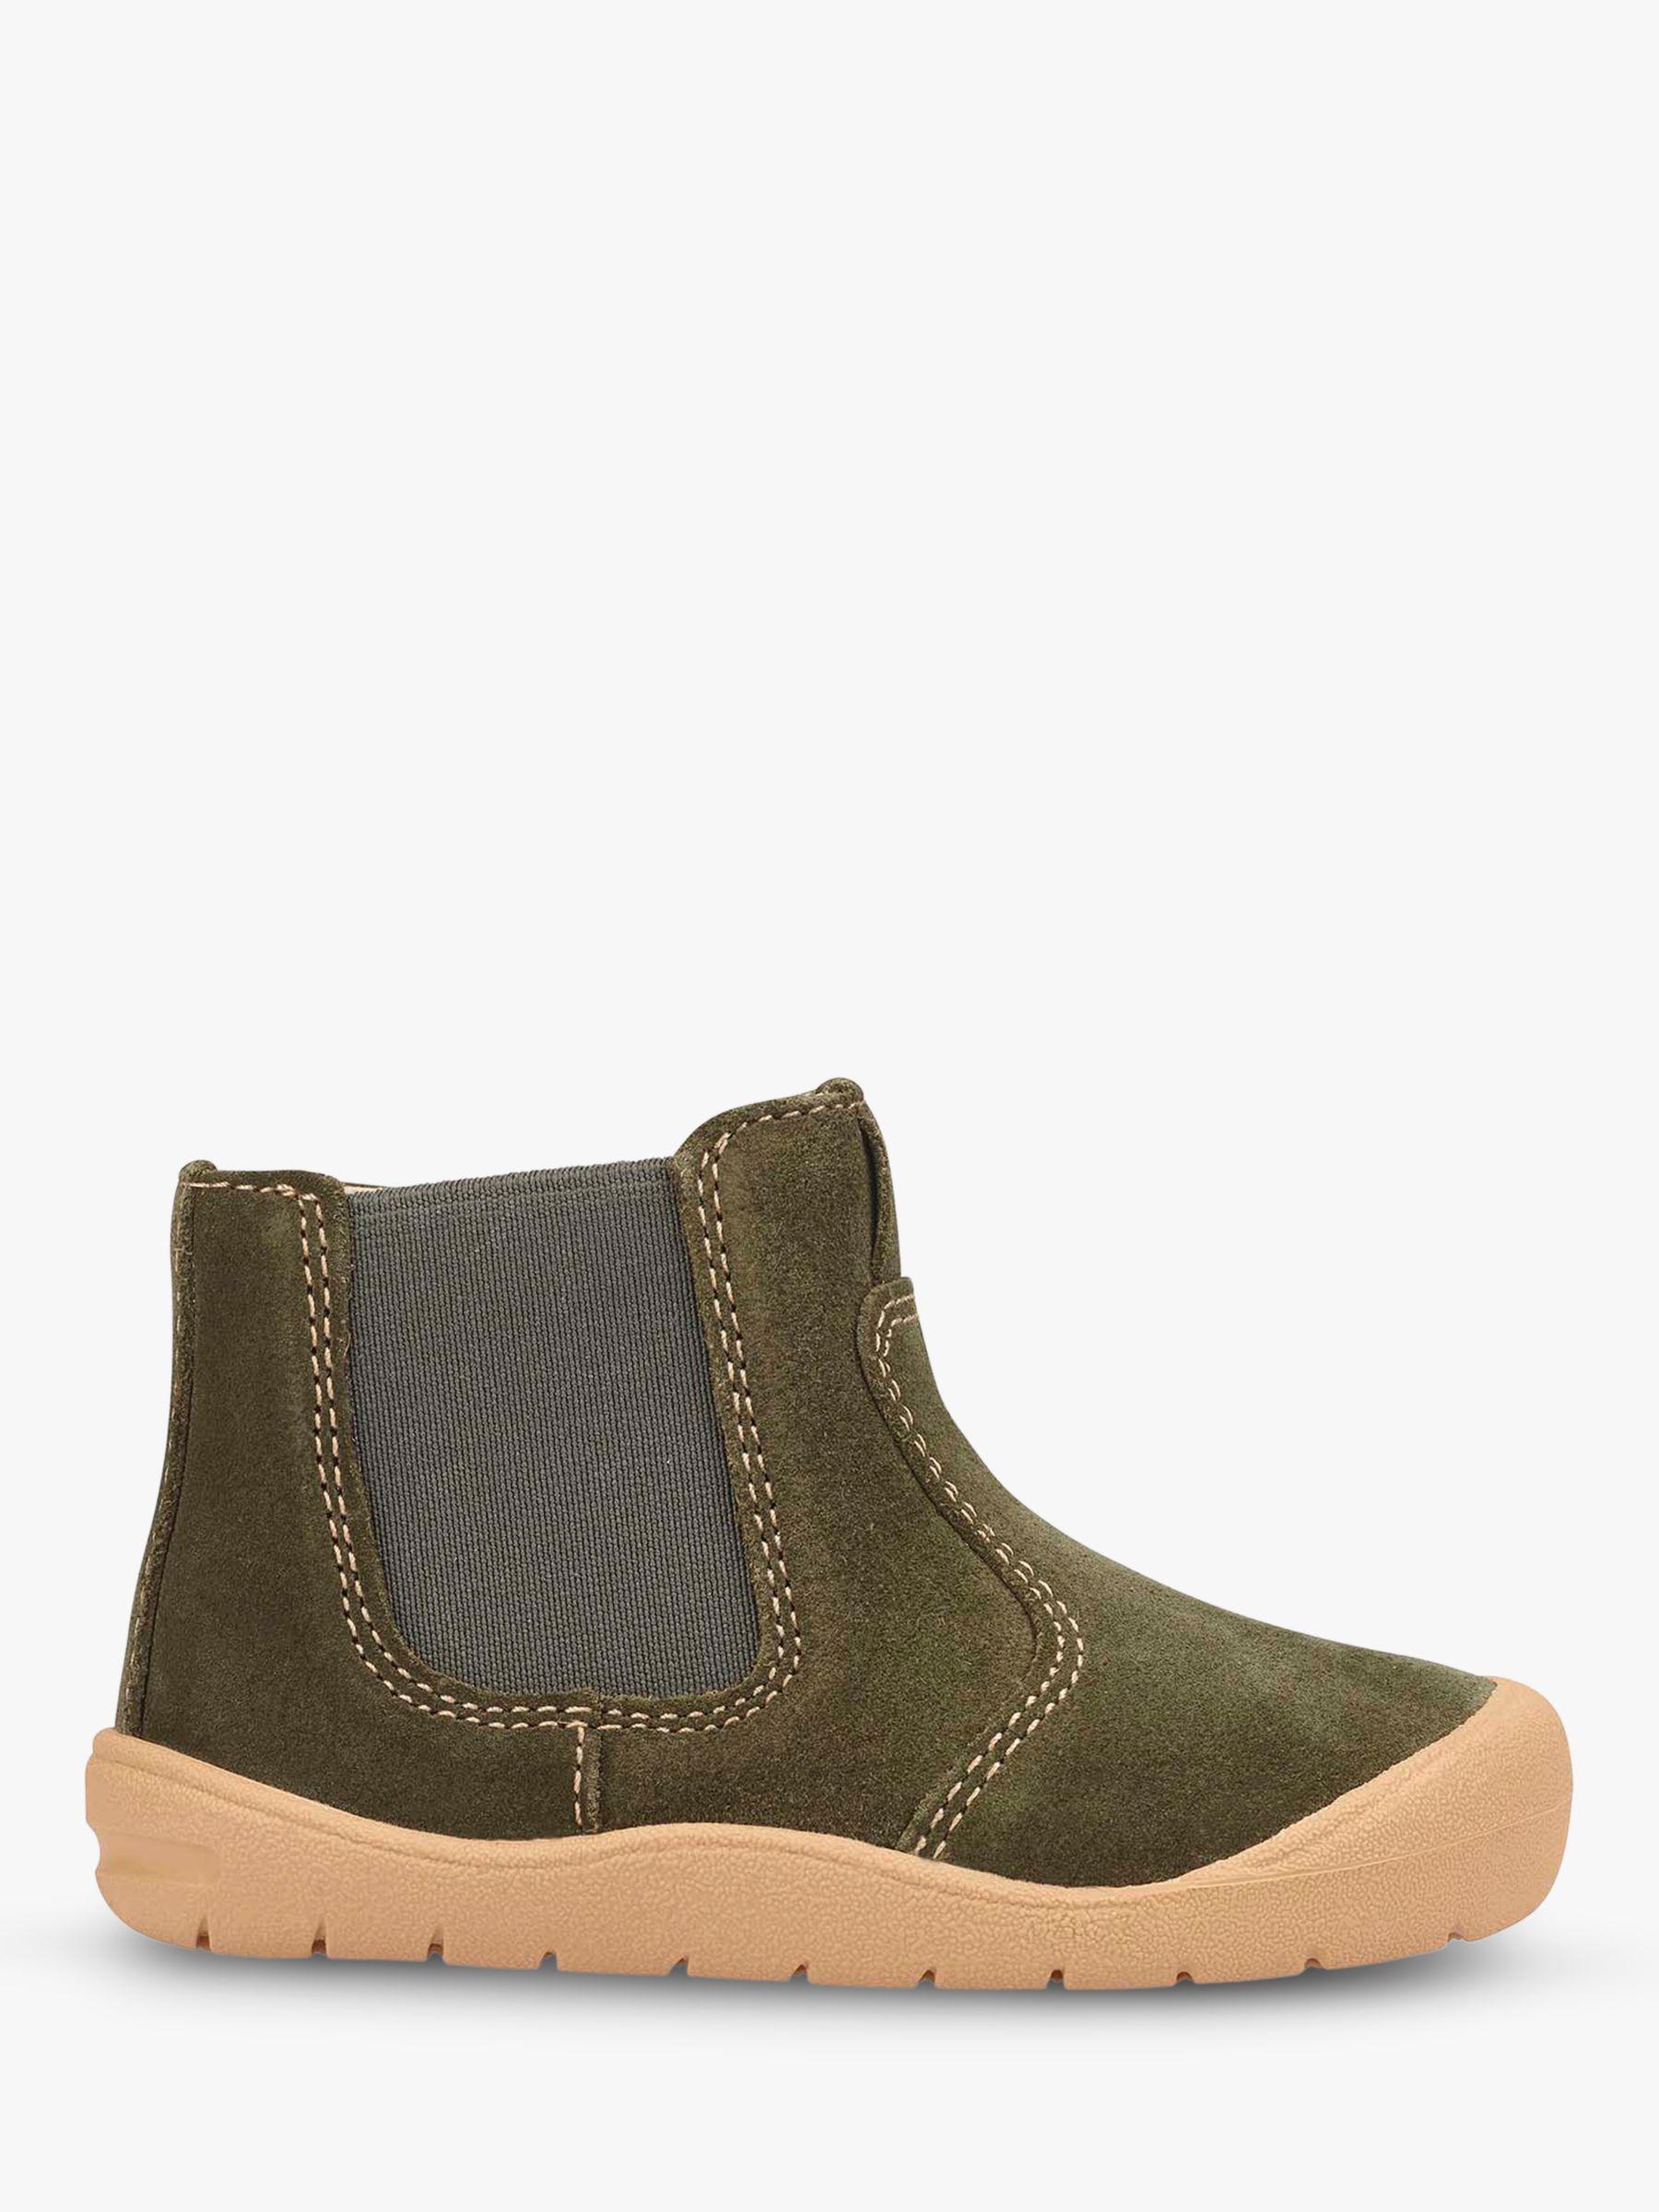 Start-Rite Start-rite Children's Leather Suede First Chelsea Boots, Khaki